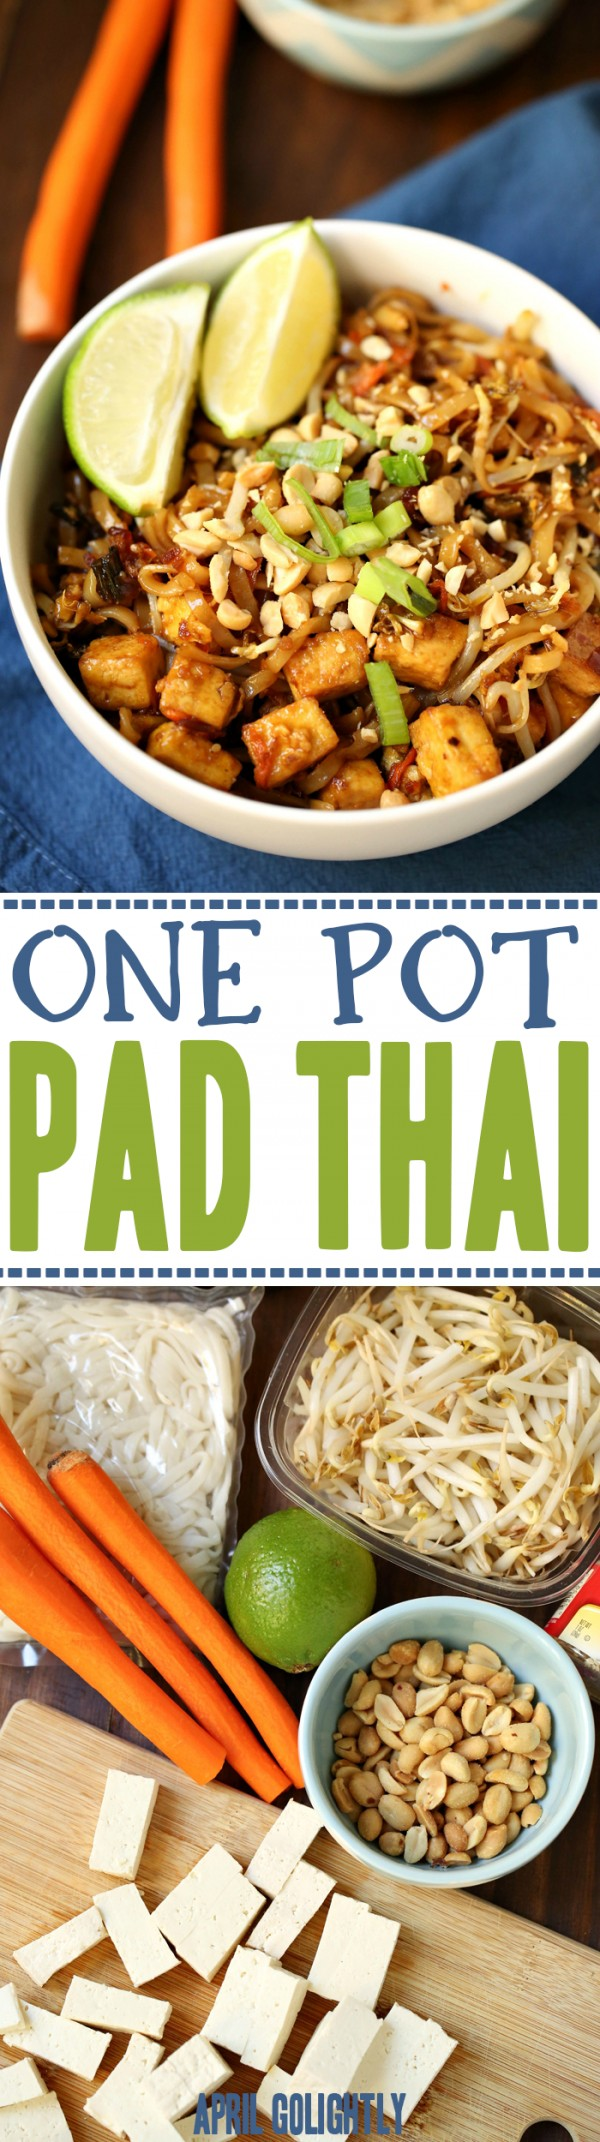 Get the recipe Pad Thai @recipes_to_go